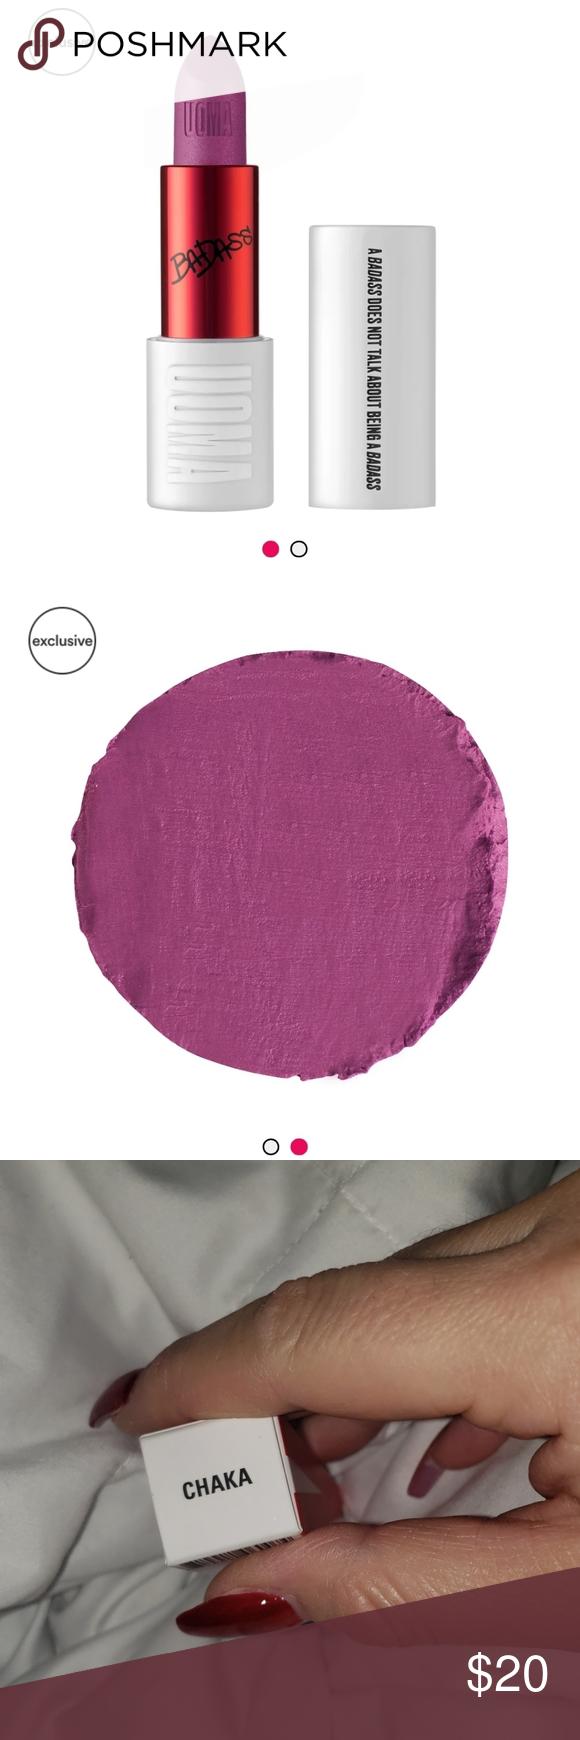 Photo of BADASS ICON Matte Lipstick Color: Chaka Pink Mauve ULTA Exclusive! Make the ulti…